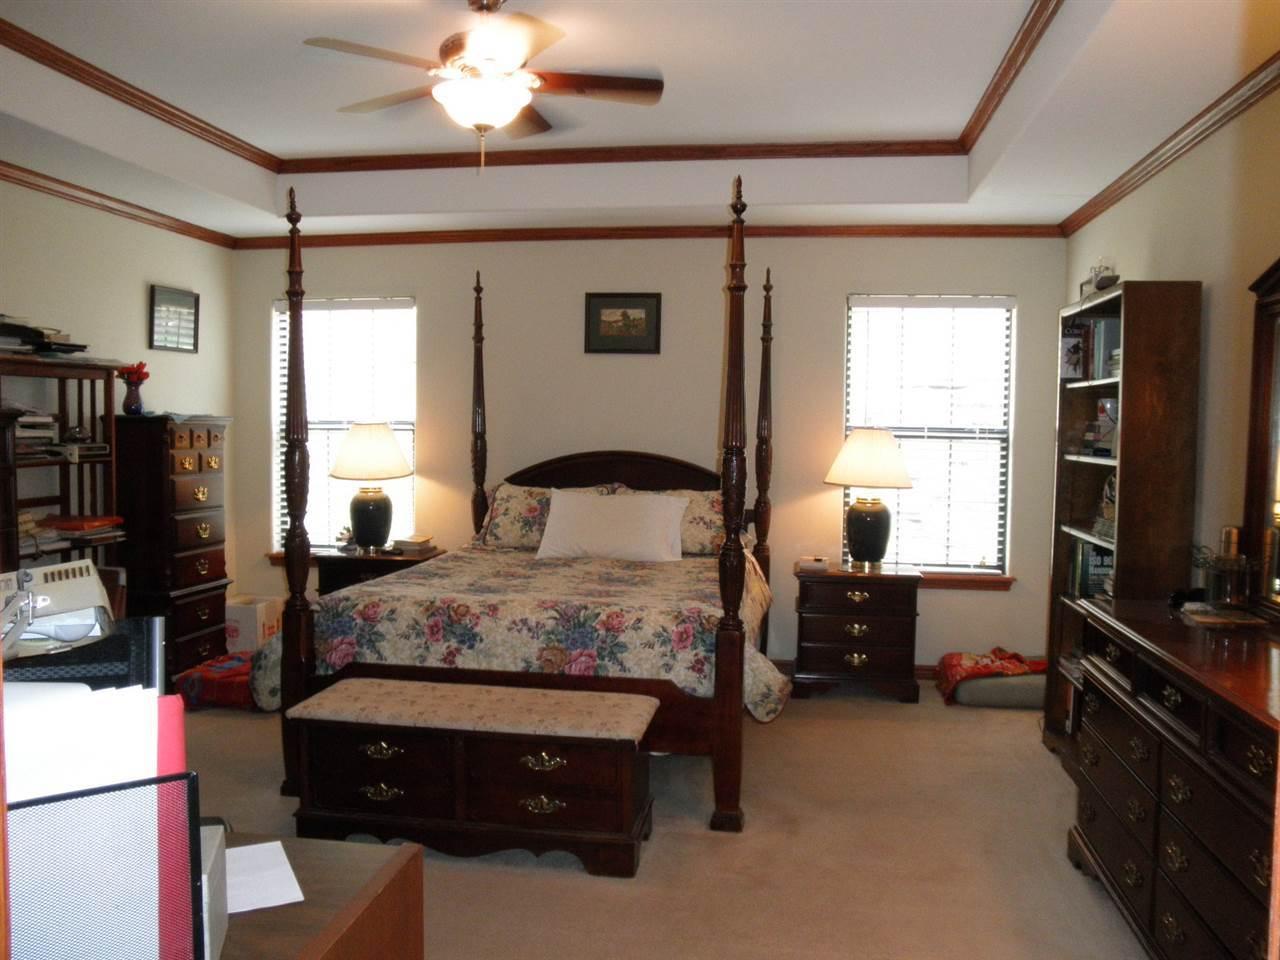 Sold Intraoffice W/MLS | 6855 Lake Road  Ponca City, OK 74604 16